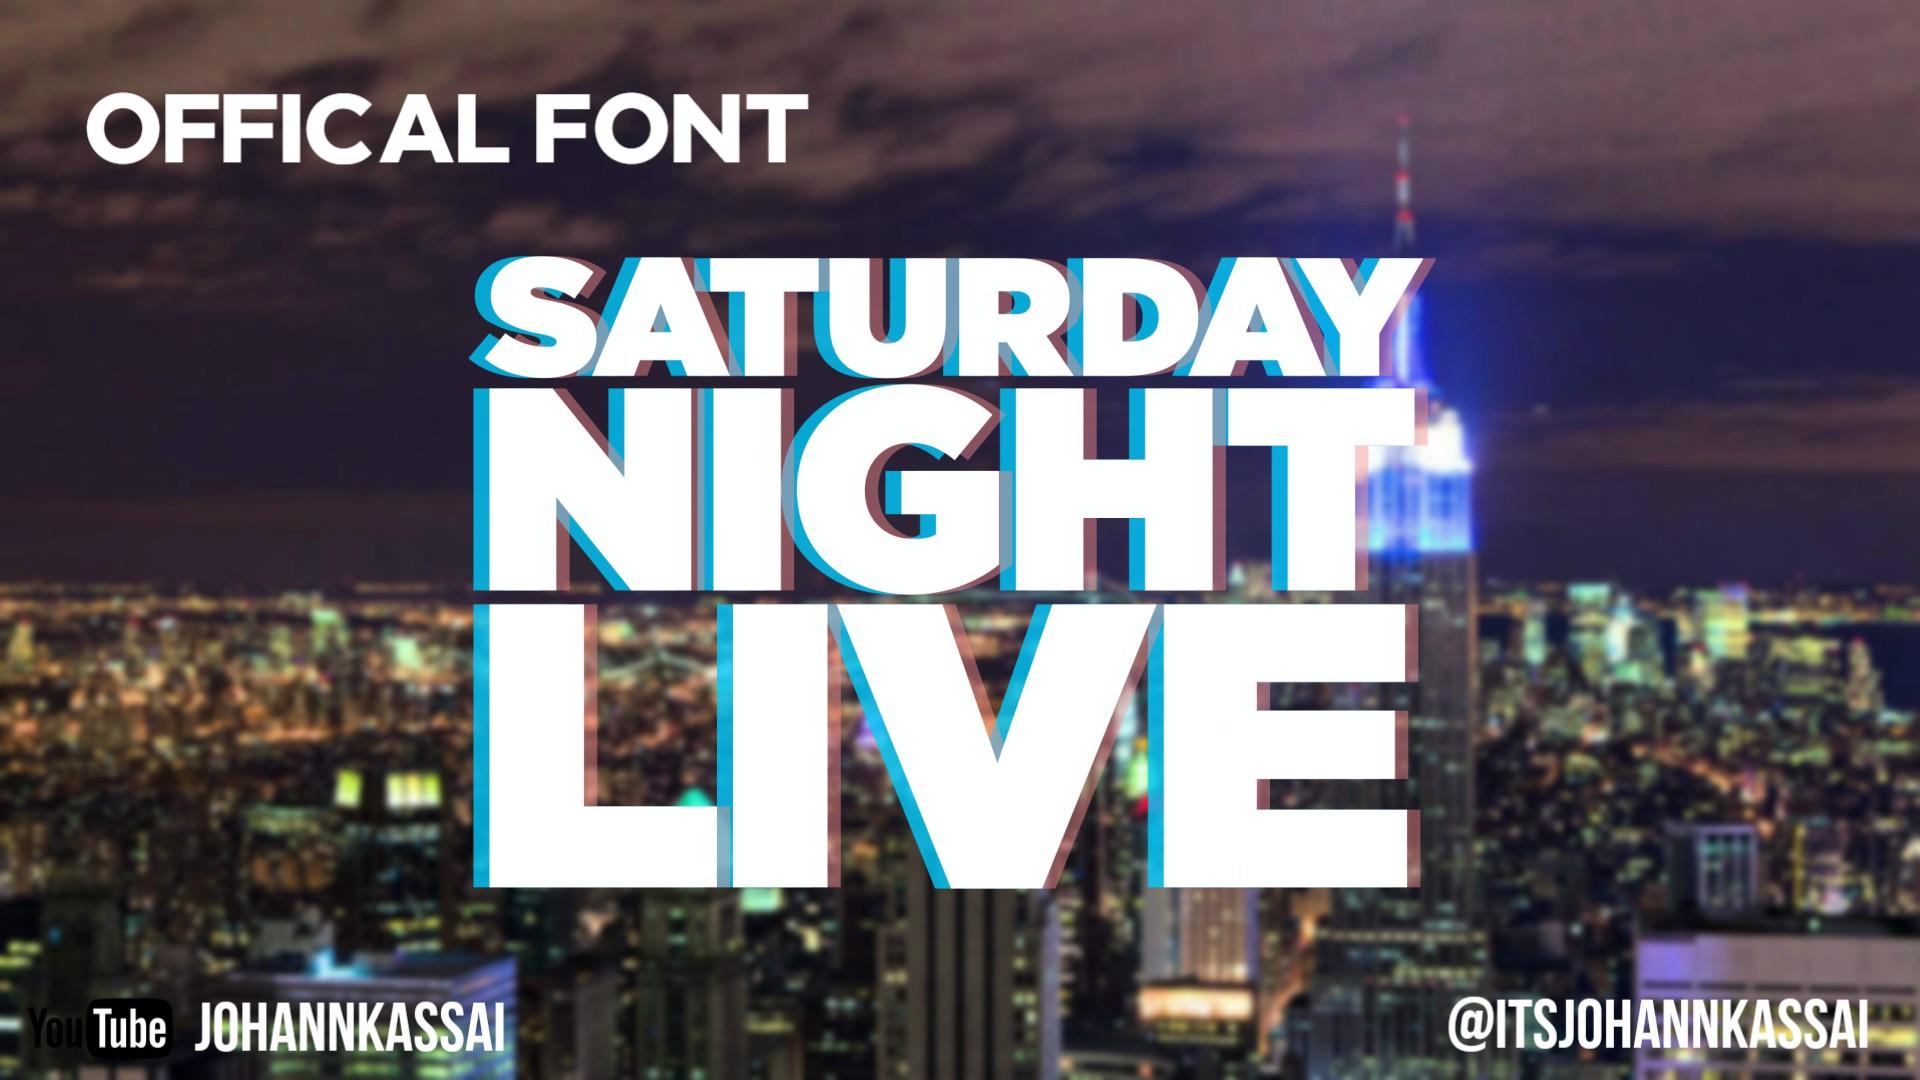 Saturday Night Live Font! free! by johannkassai on DeviantArt